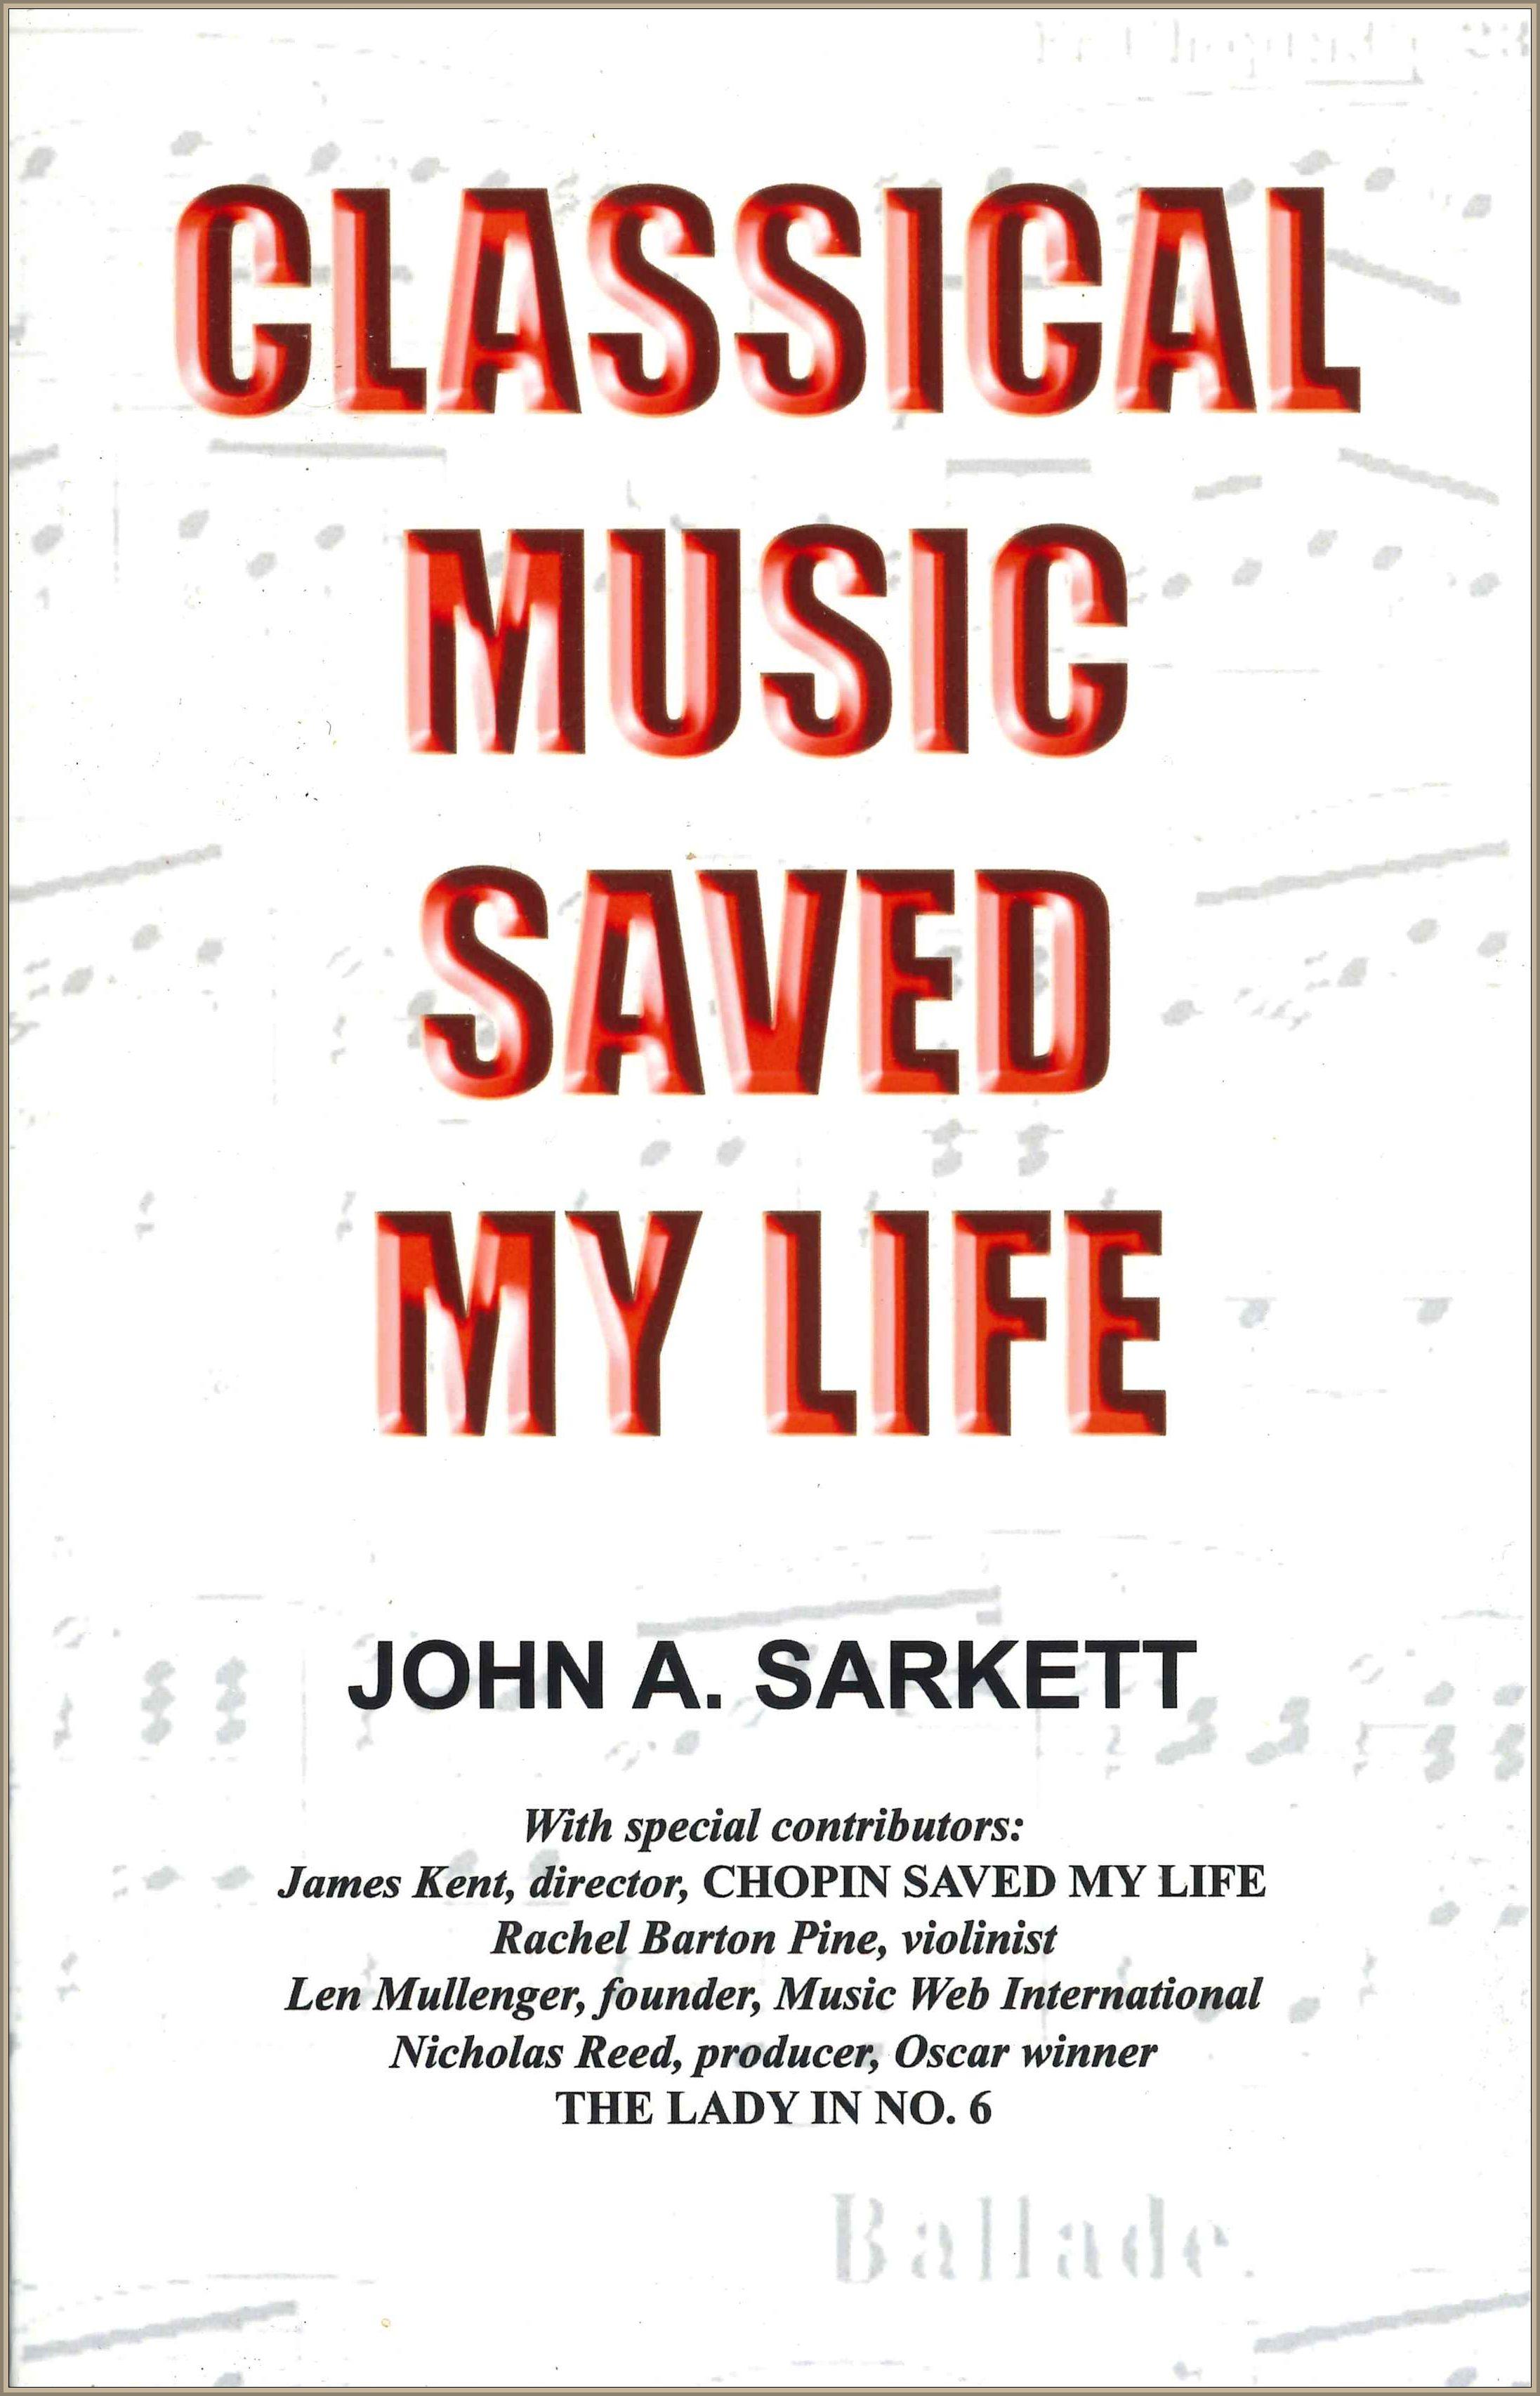 Scarlett book